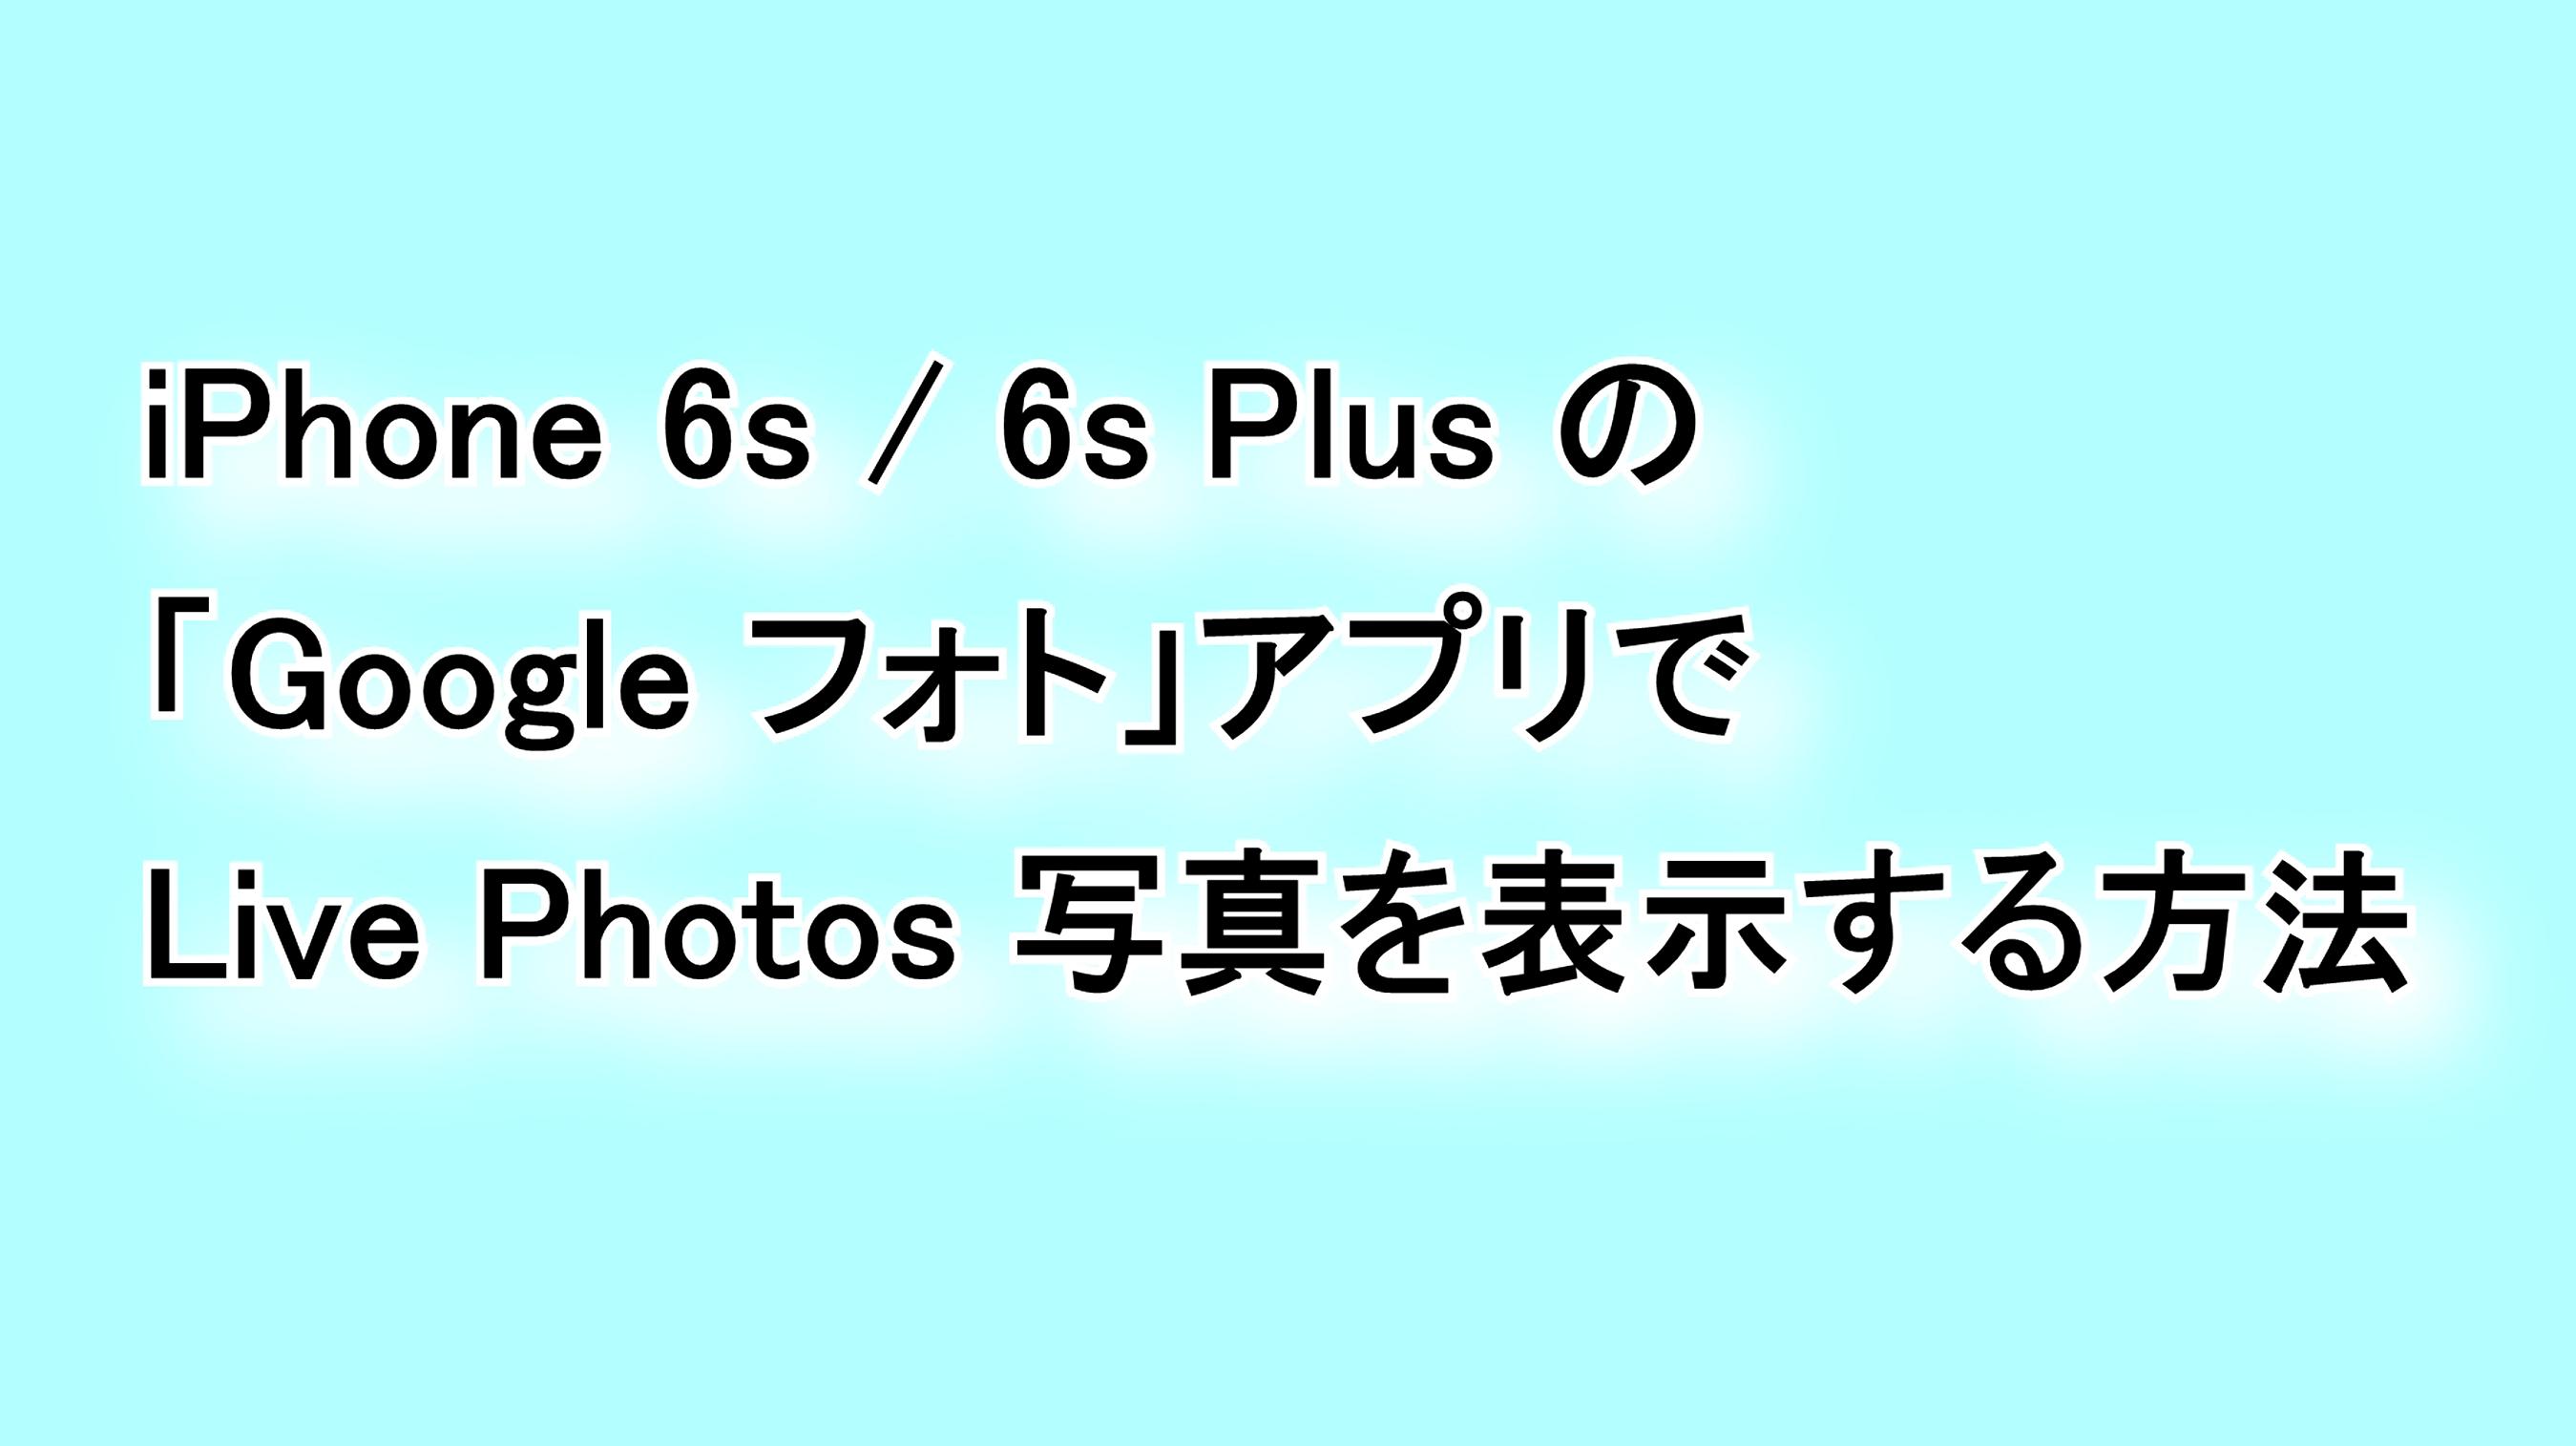 iPhone 6s/6s Plusの「Google フォト」アプリでLive Photos写真を表示する方法